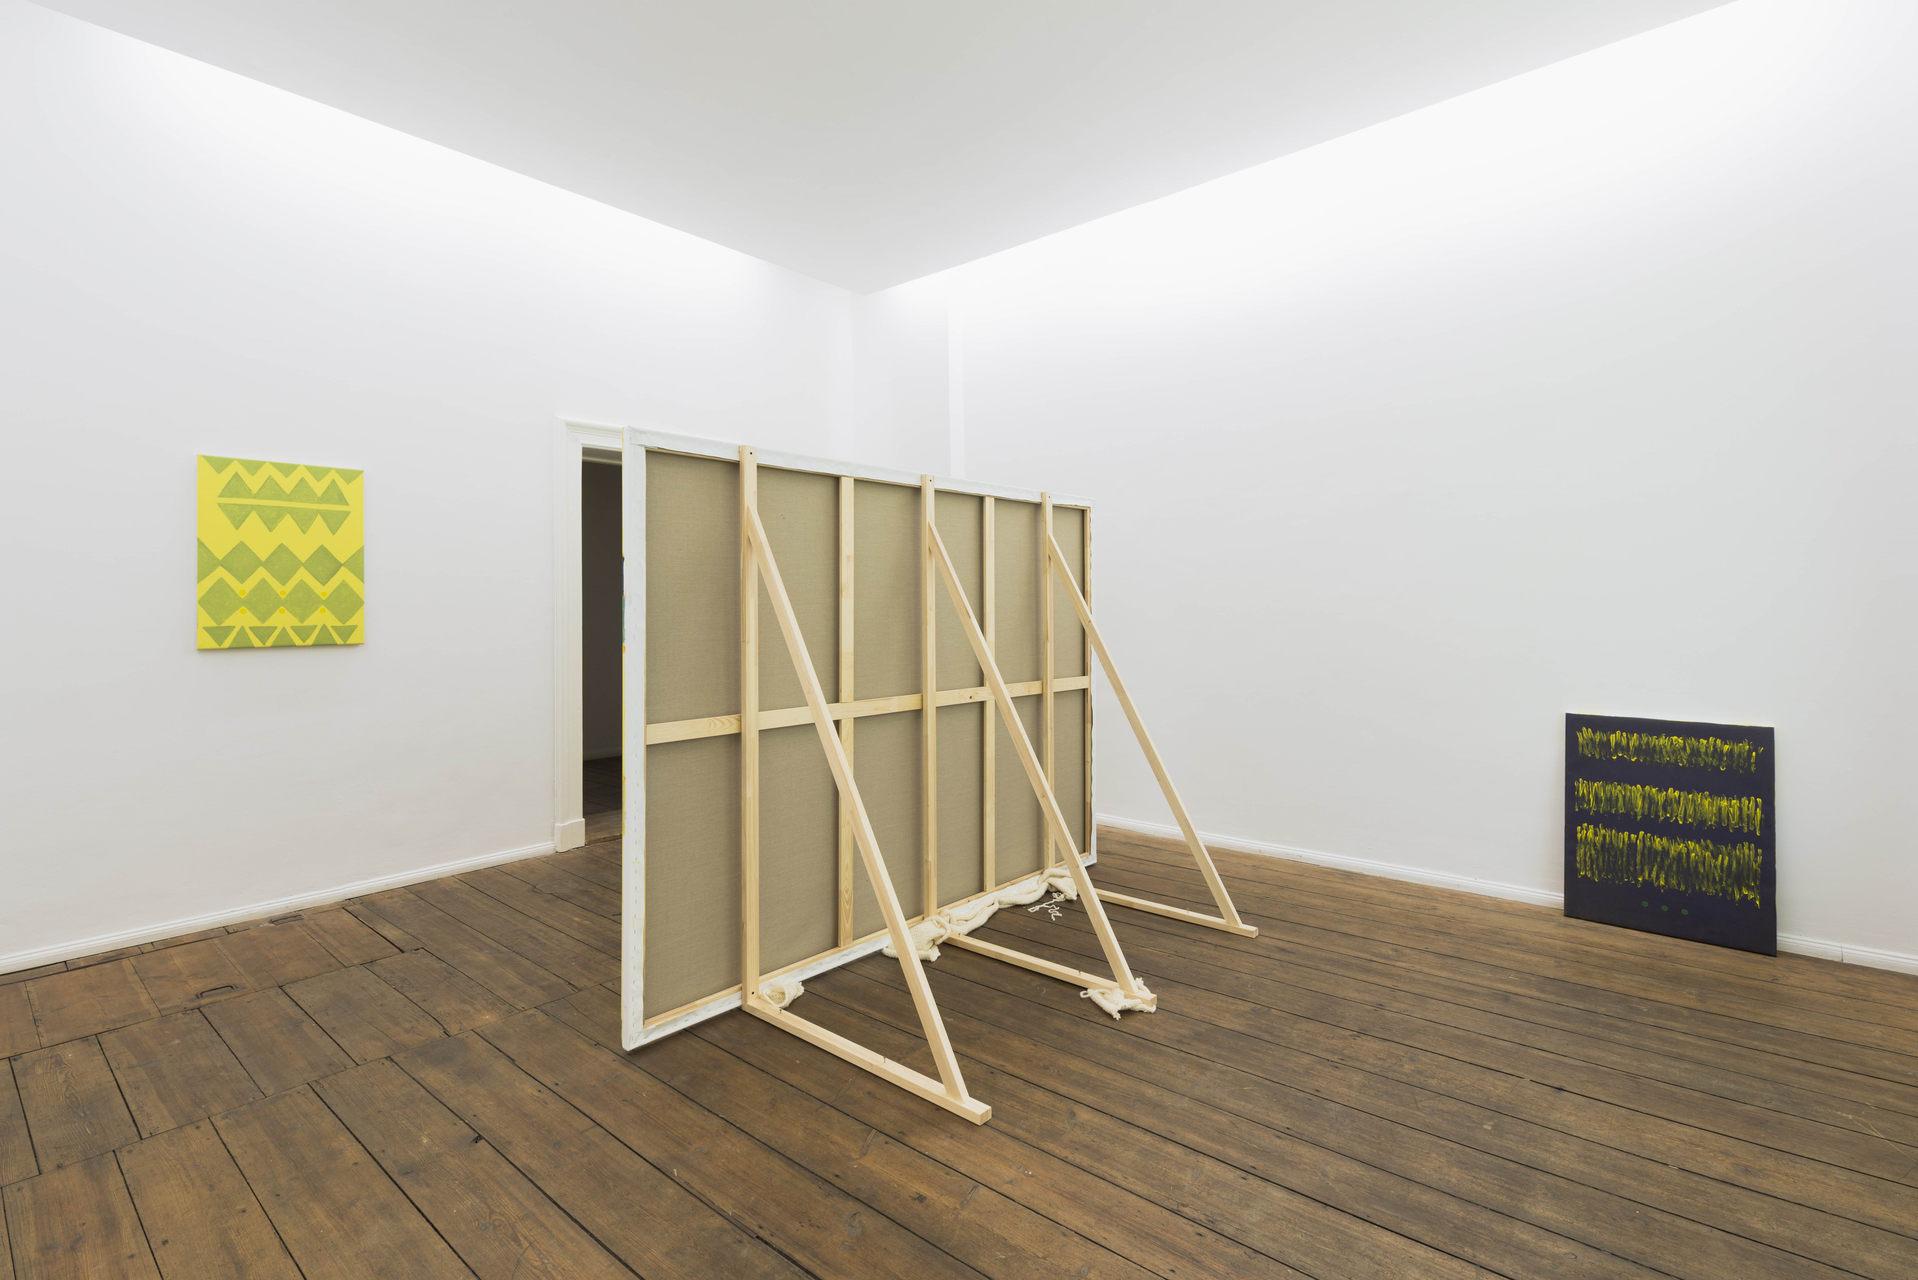 TGood TSJO¦êRBERG artdoc Grimmuseum 27 02 2015 _0125